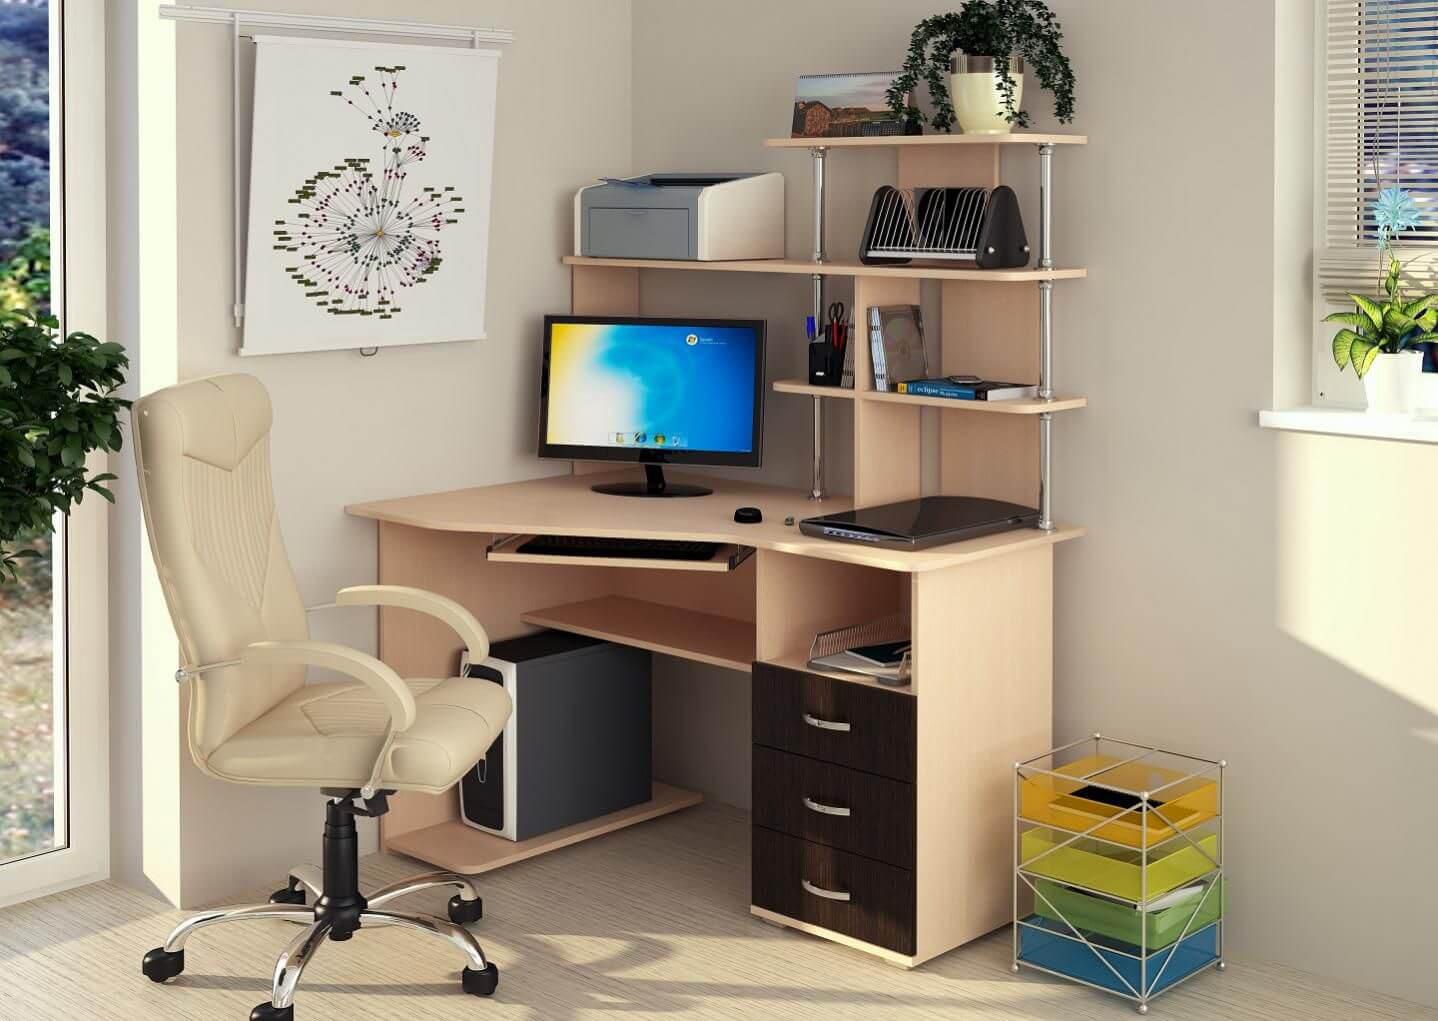 Фото углового компьютерного стола с надстройкой